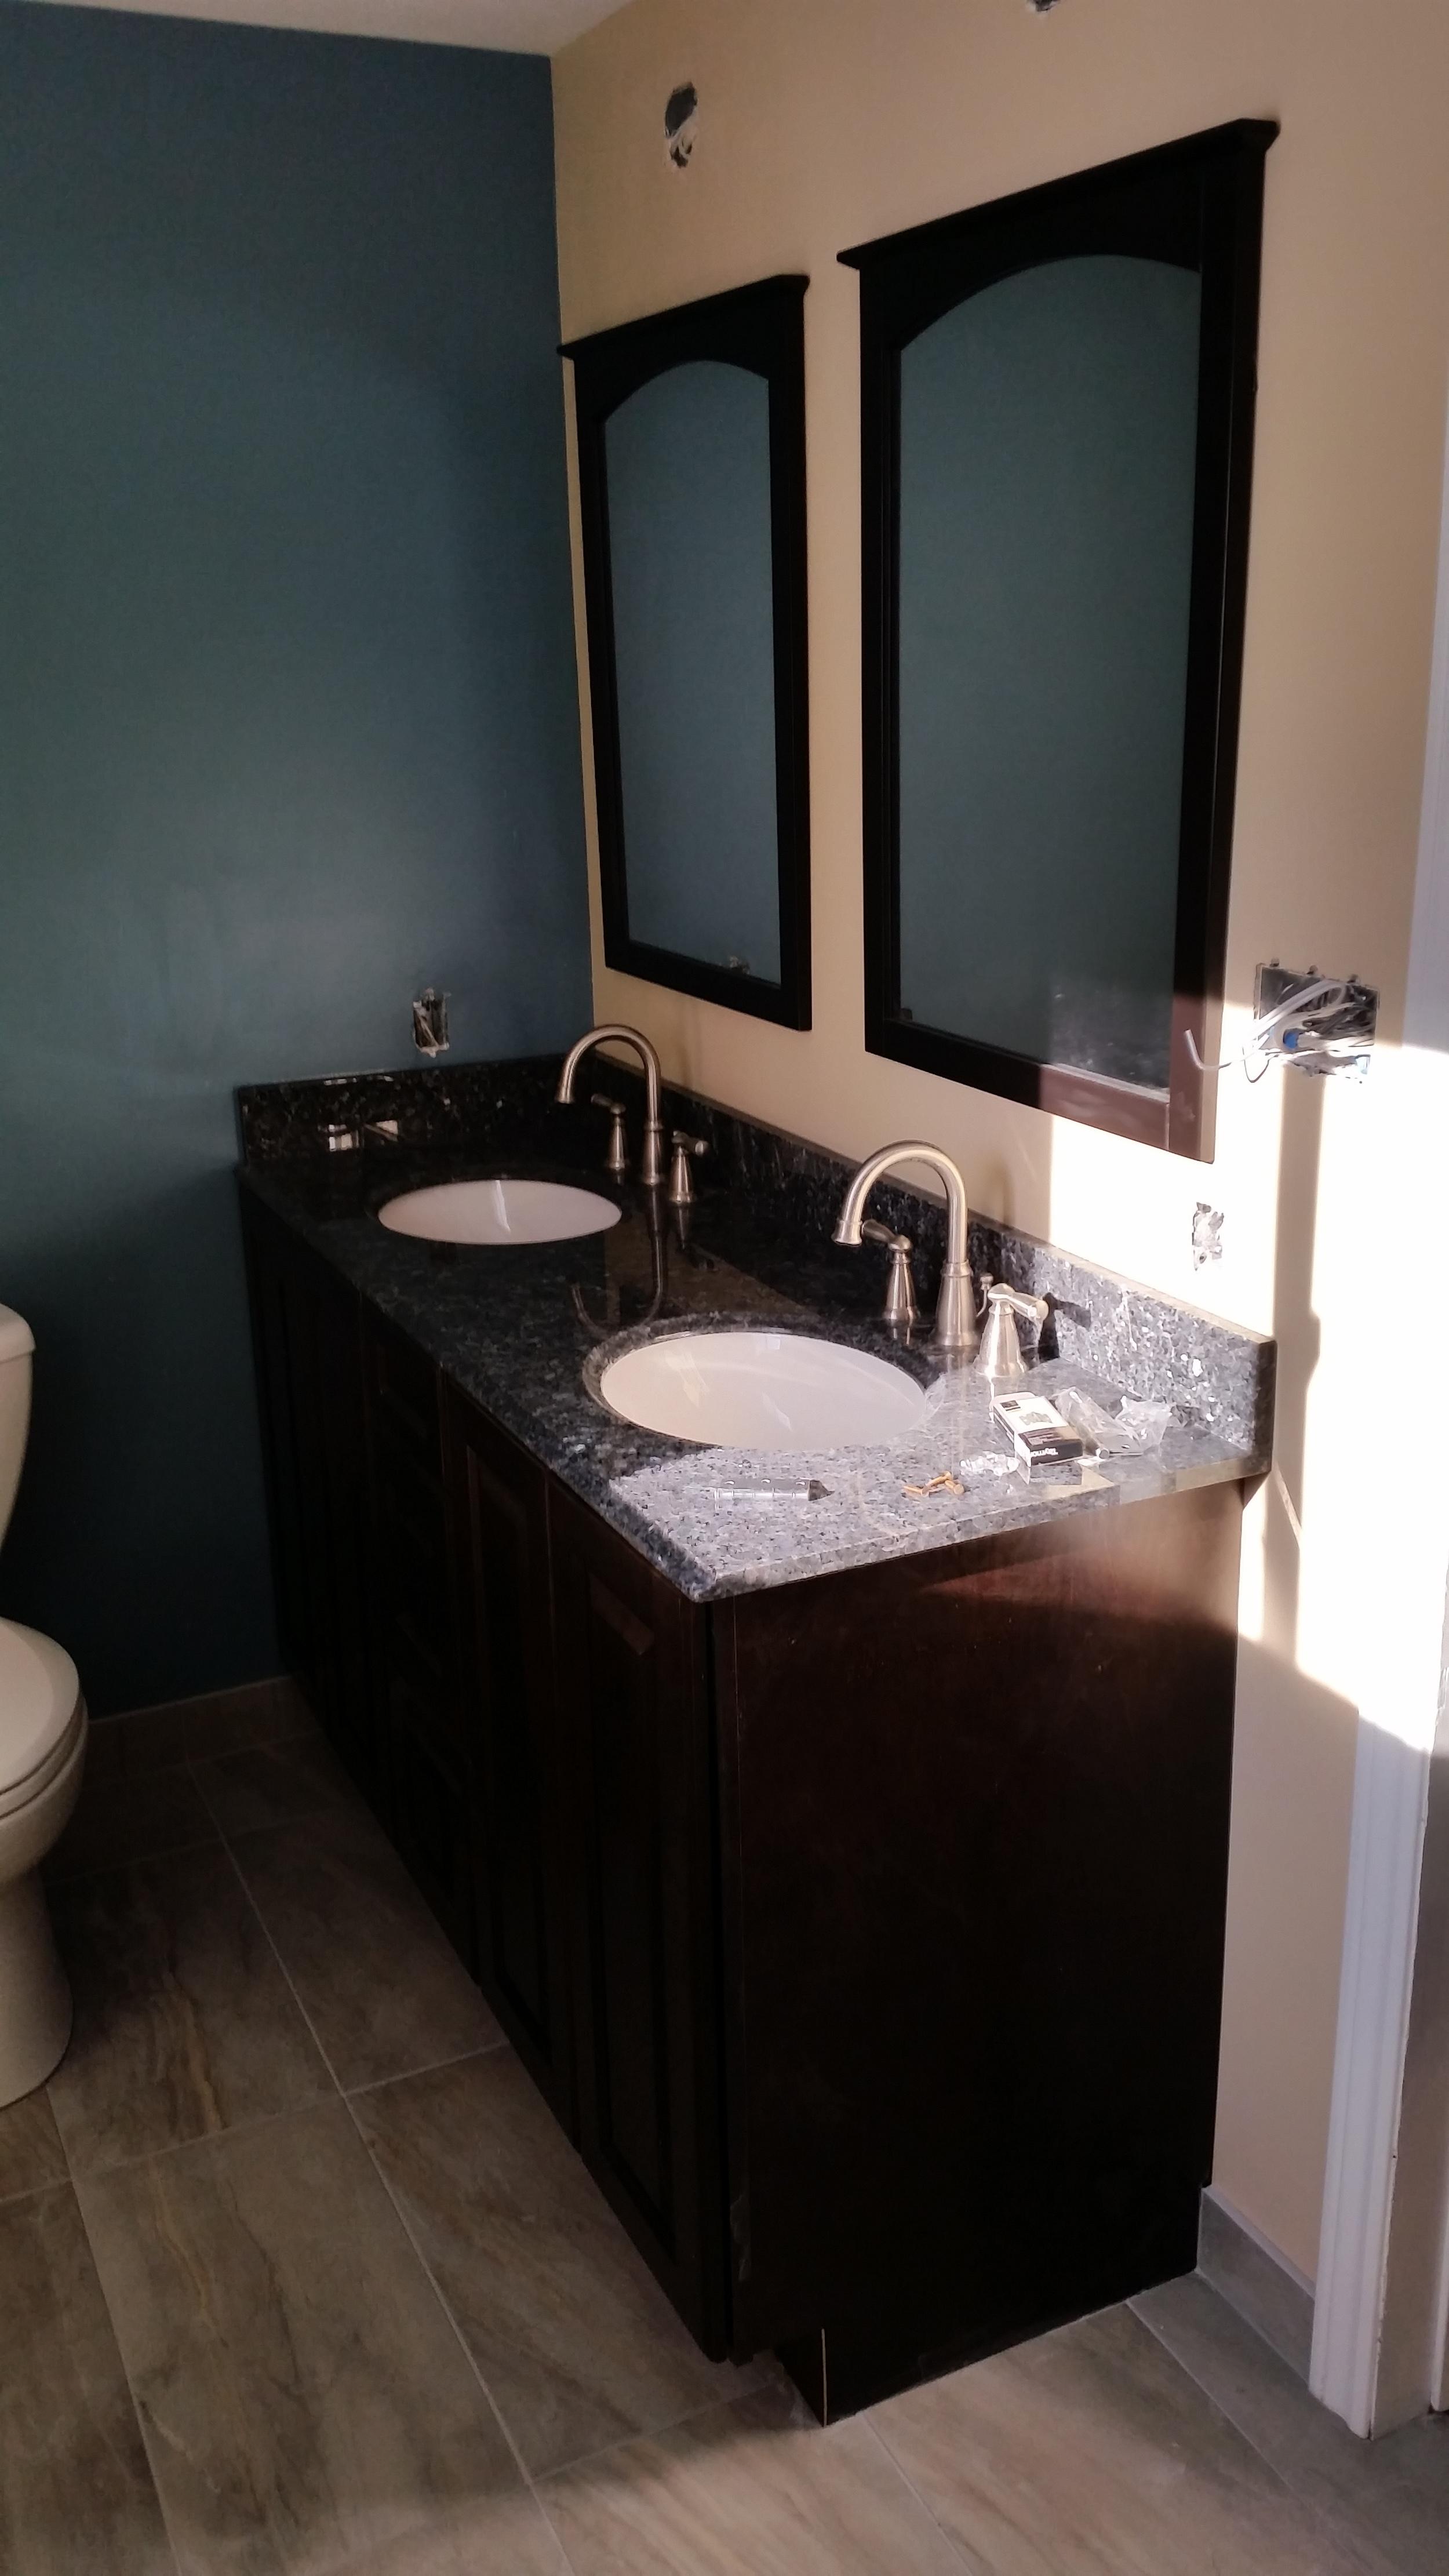 Bathroom_2_1.jpg